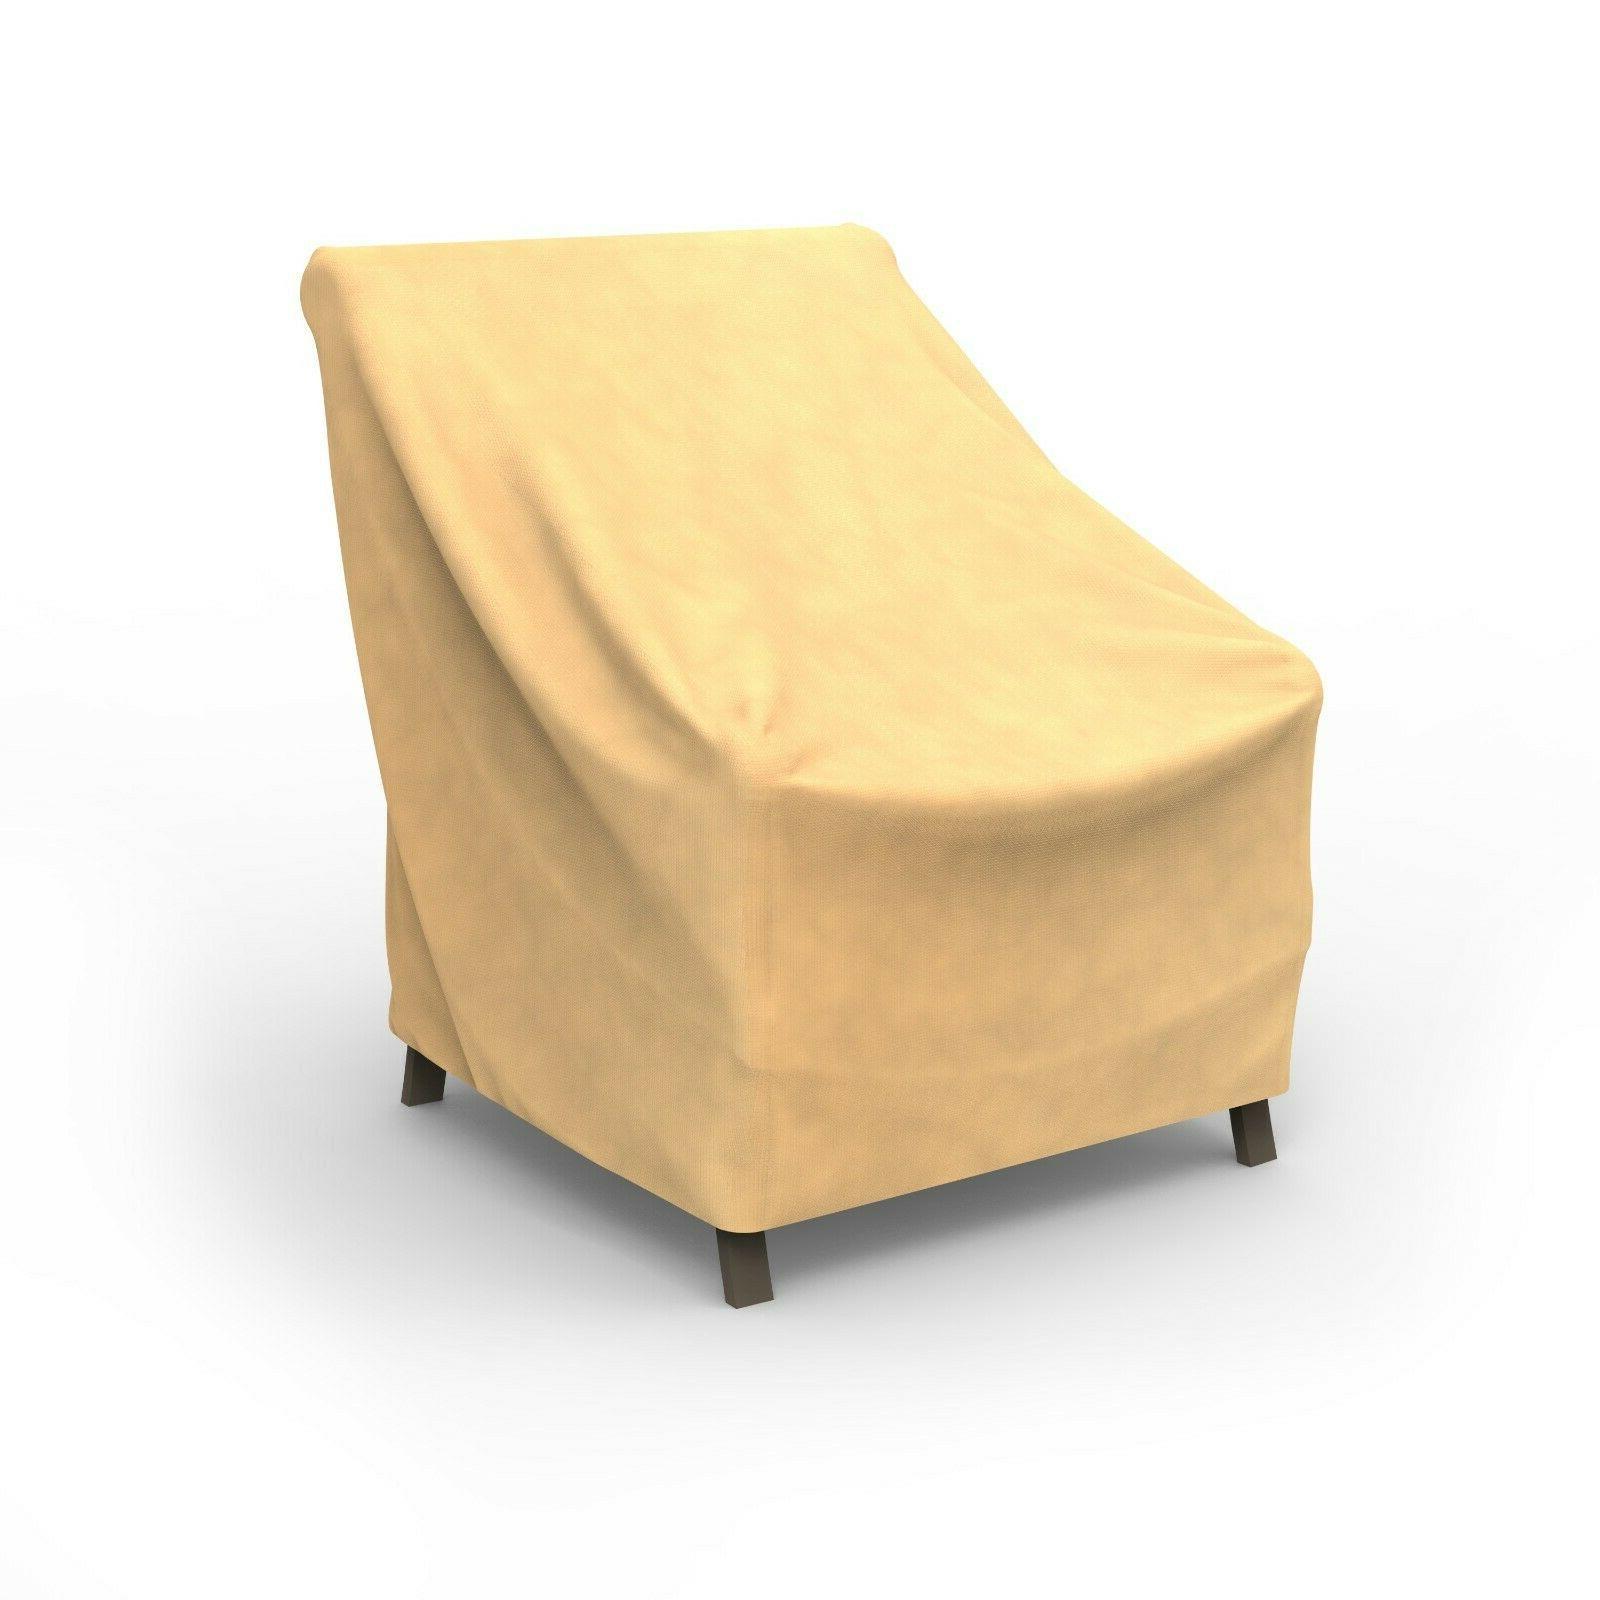 Patio Outdoor Garden Furniture Dust UV